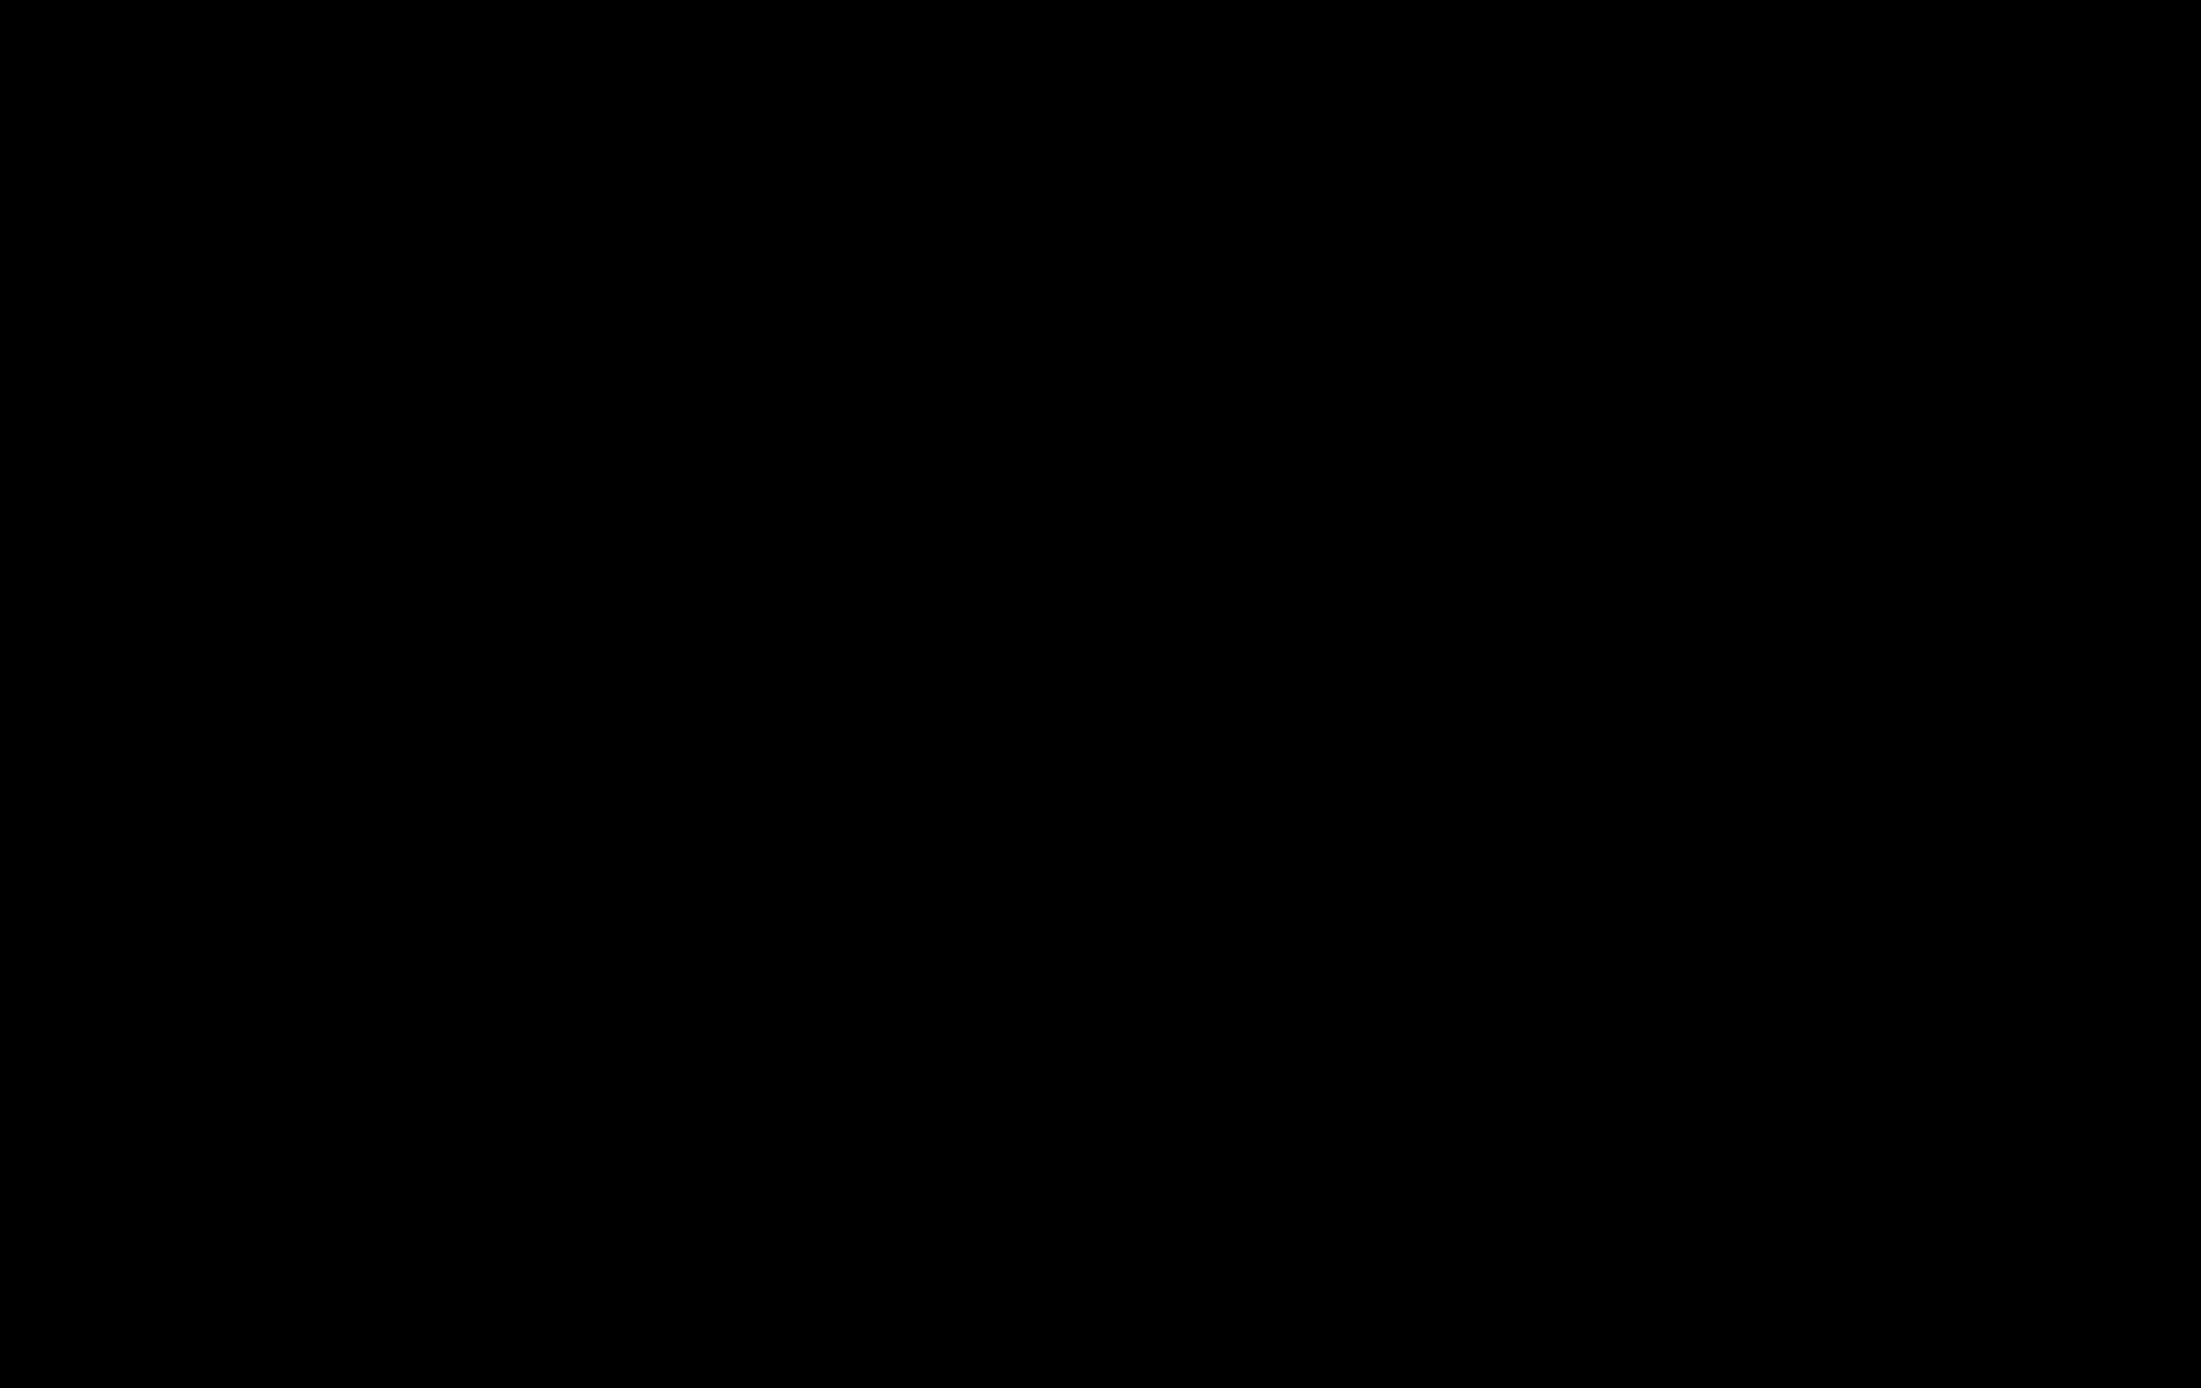 2201x1388 Big Cat Clipart Dog Outline